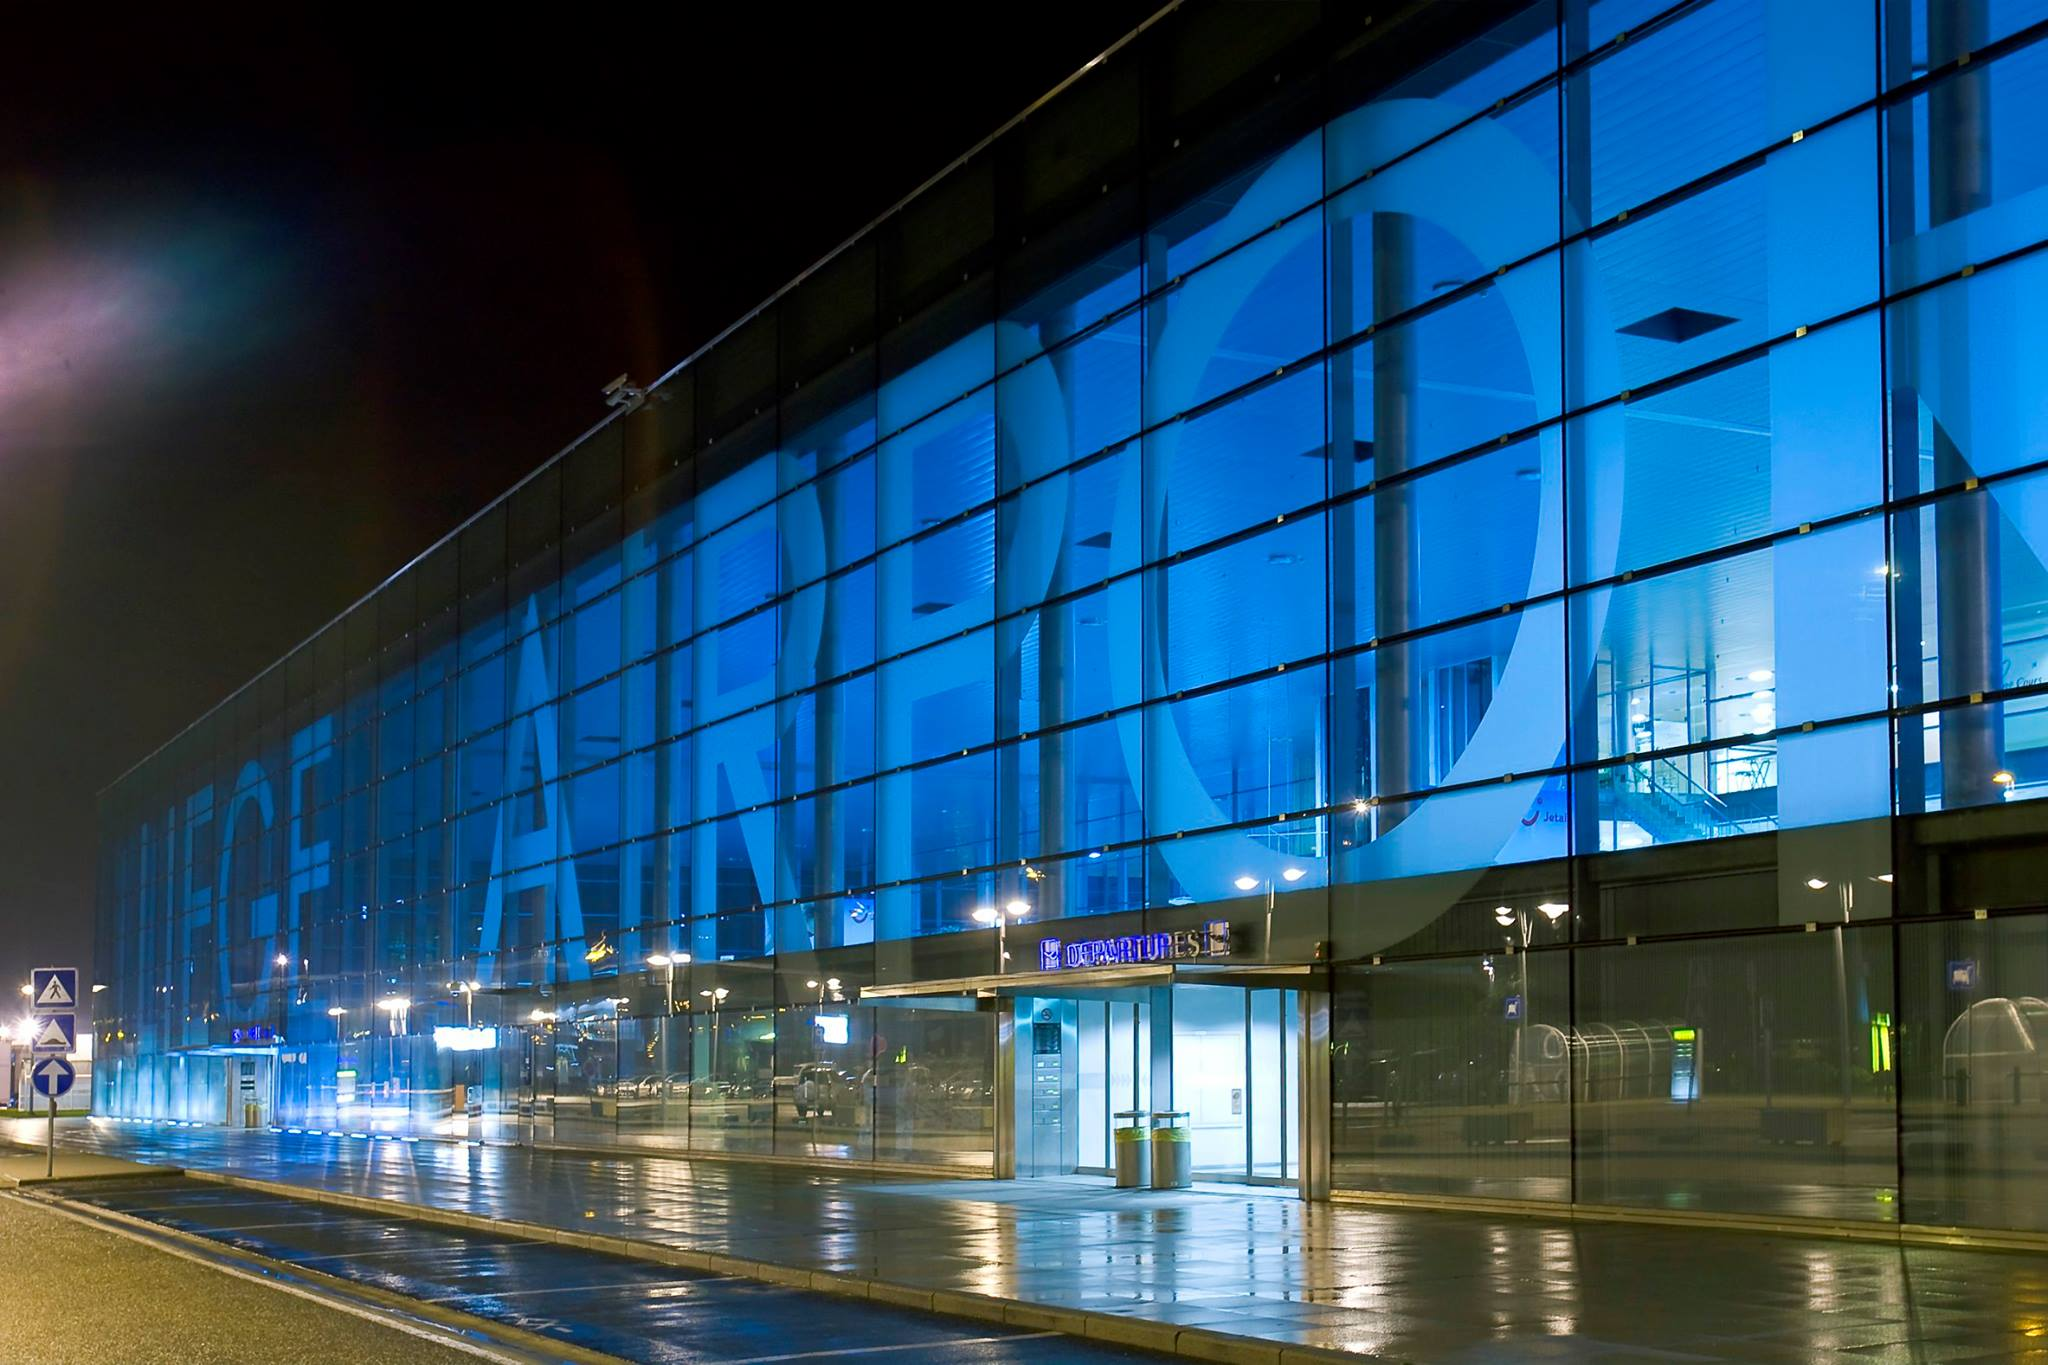 Terminal Liege Airport